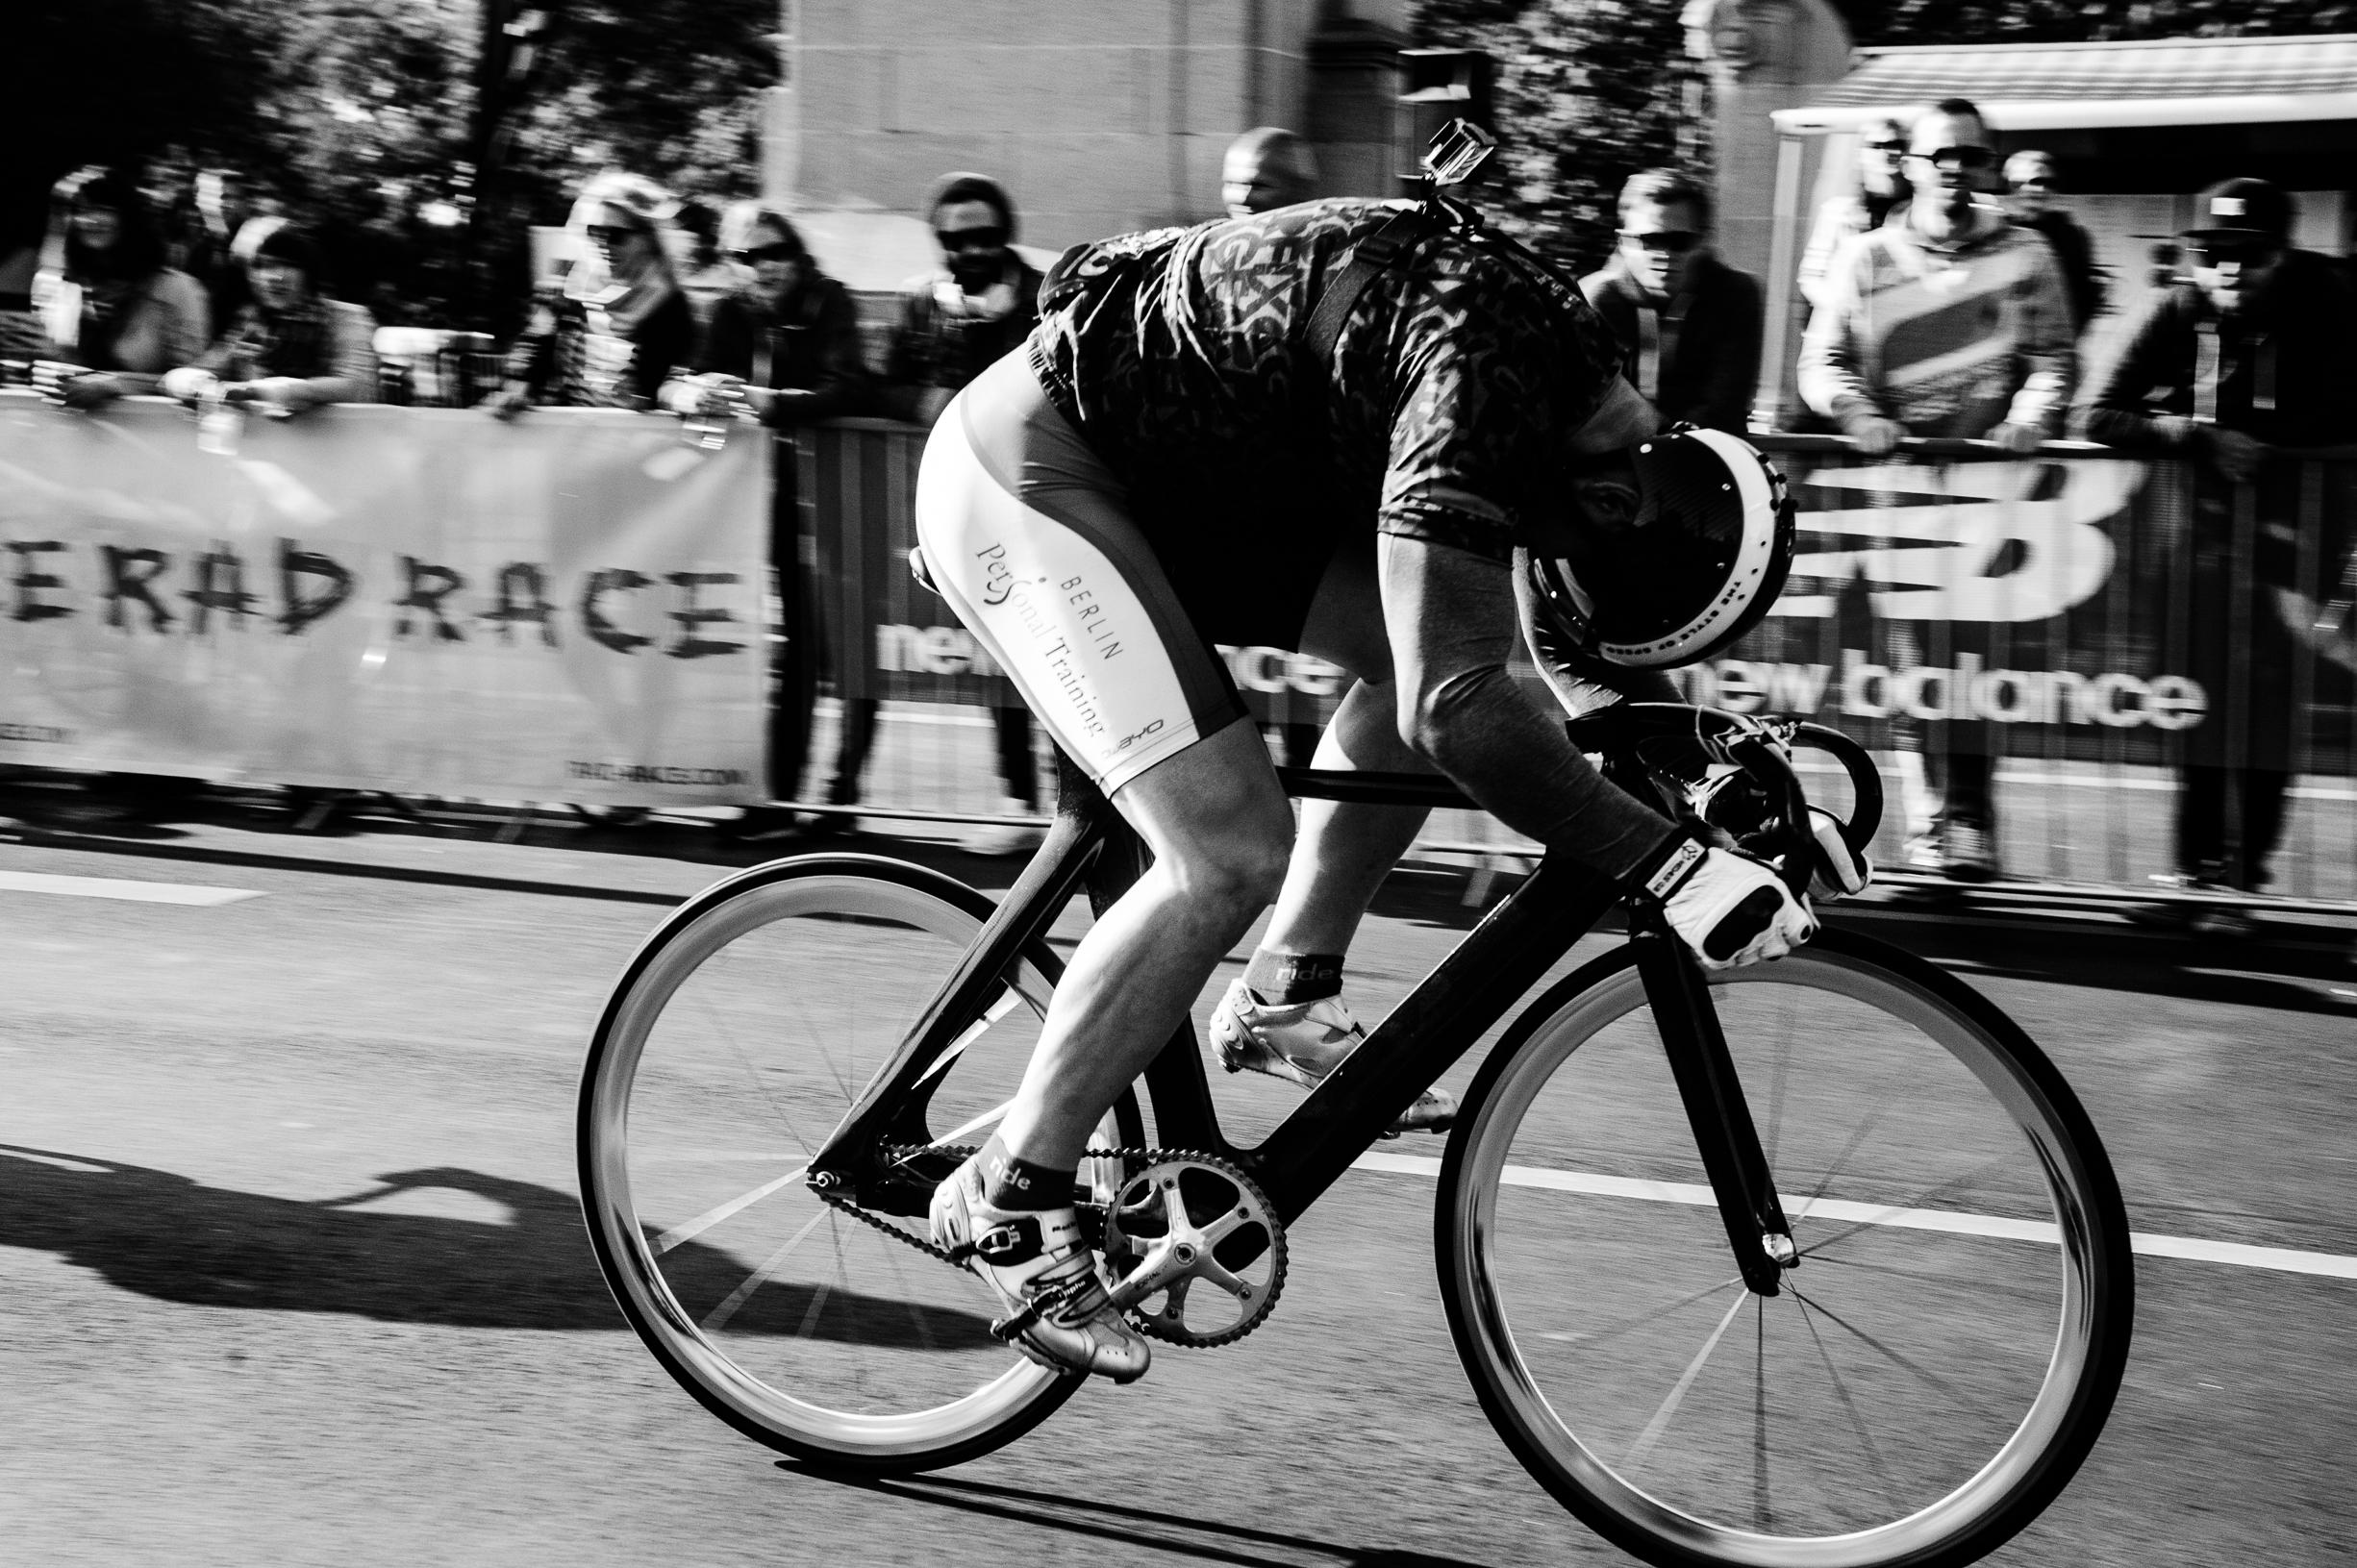 RAD RACE Battle, Berlin May 30 2015 Photo by Drew Kaplan_05.jpg